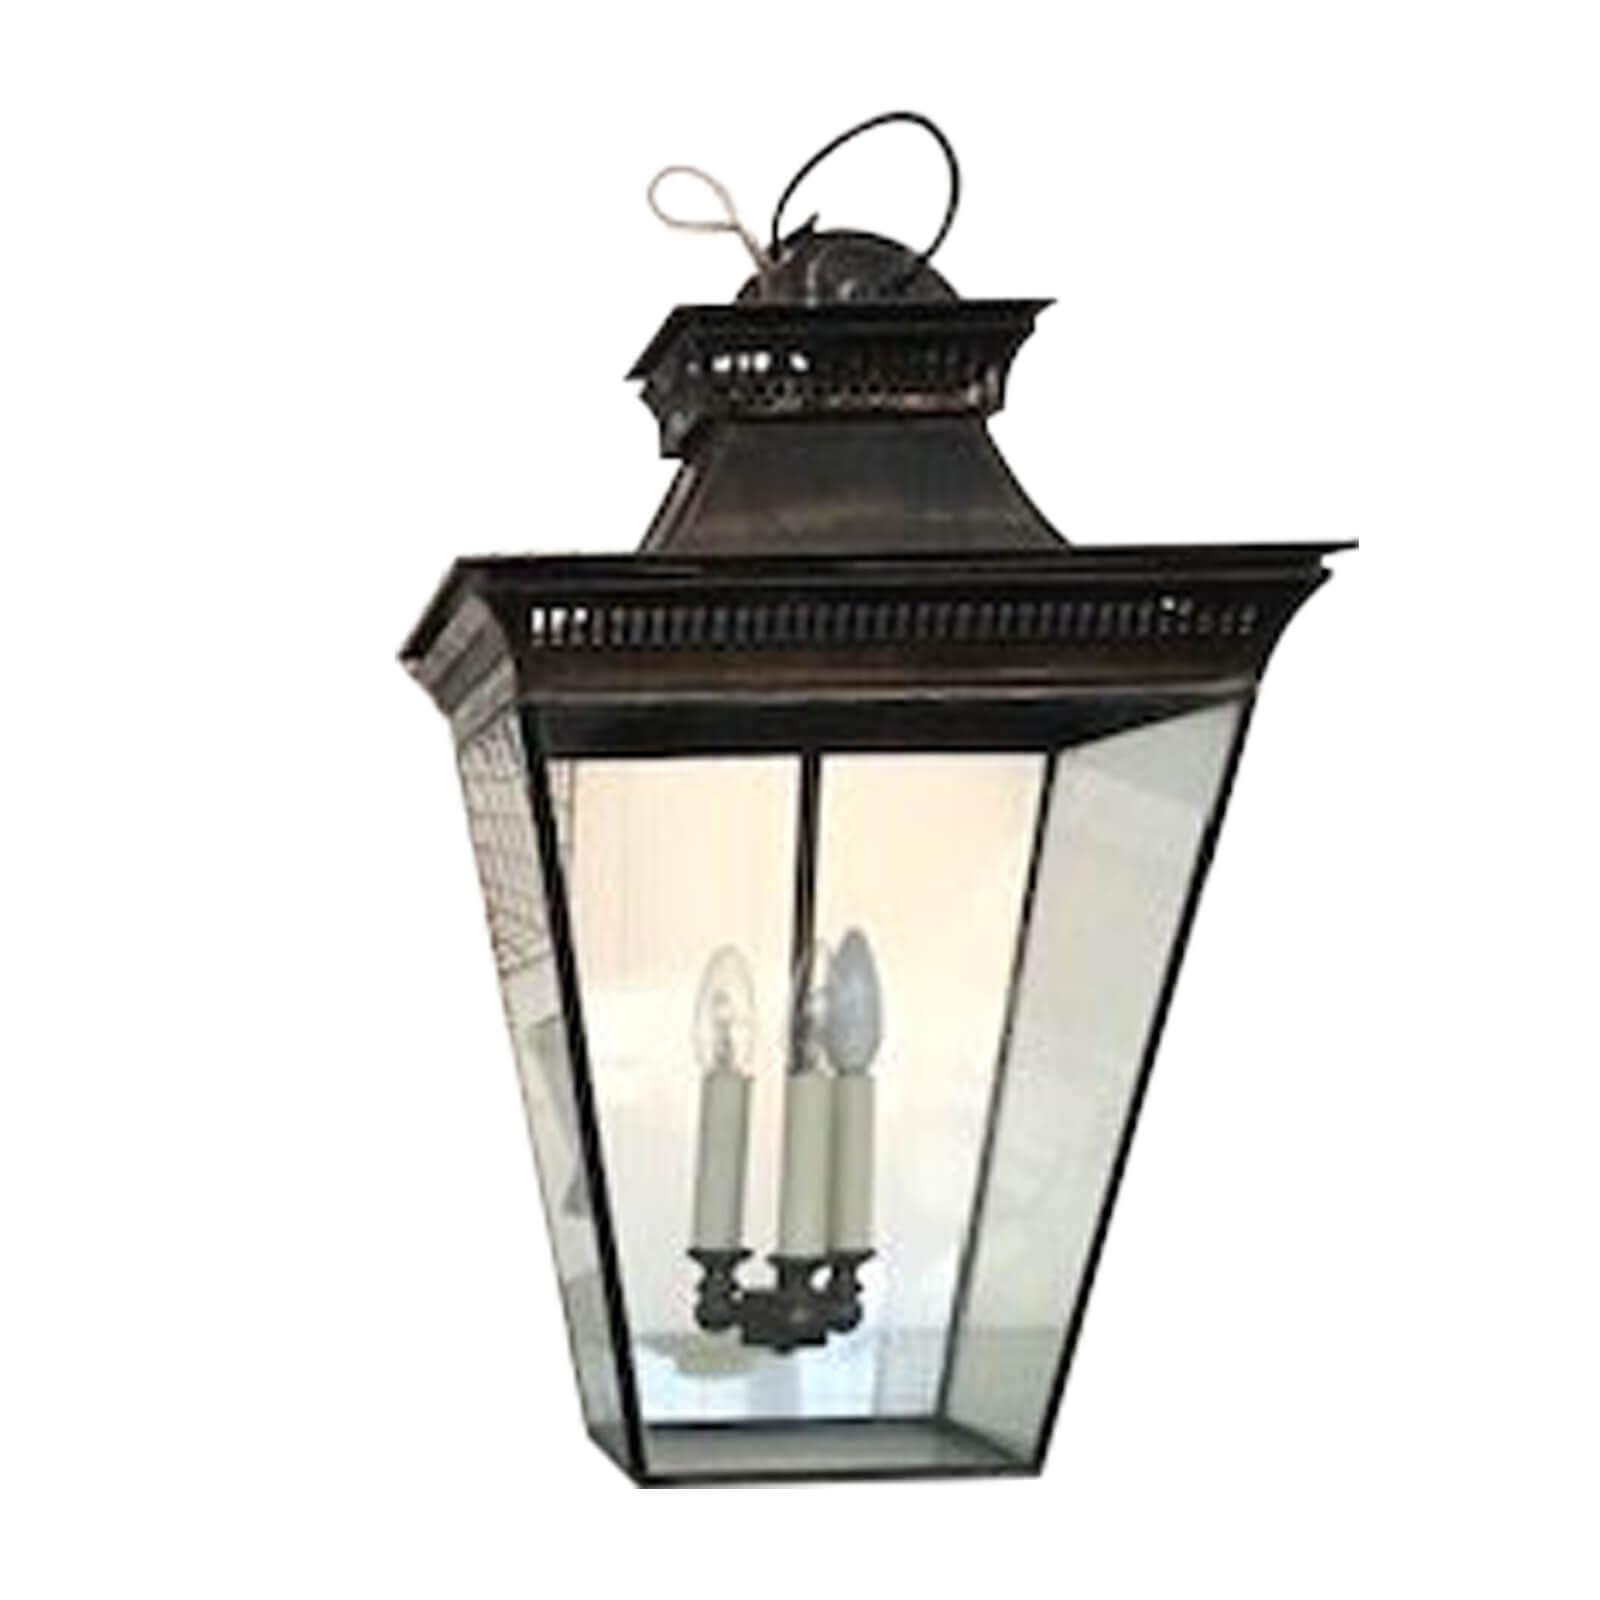 Rustic Coast Furniture lantern